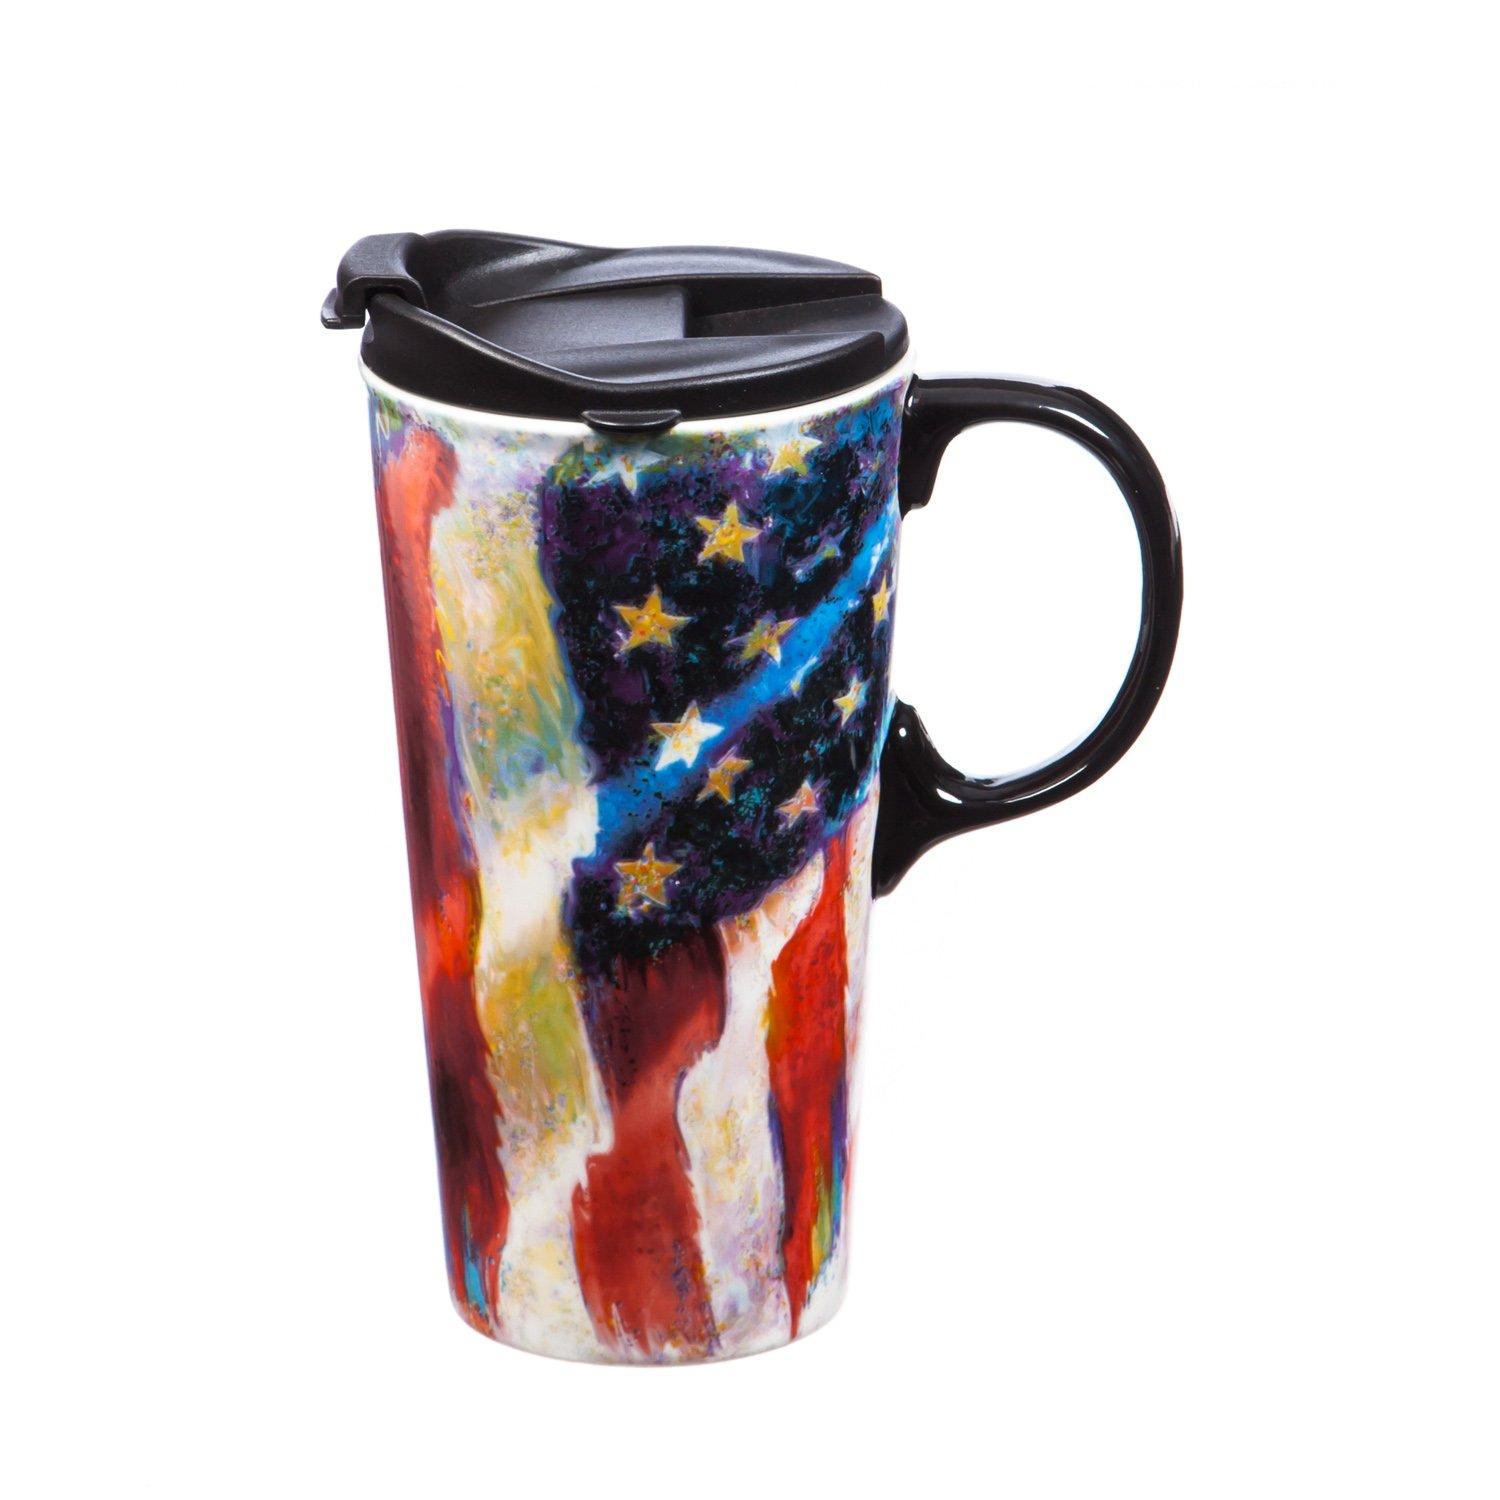 Cypress Home Old Glory American Flag Ceramic Travel Coffee Mug with Gift Box, 17 ounces